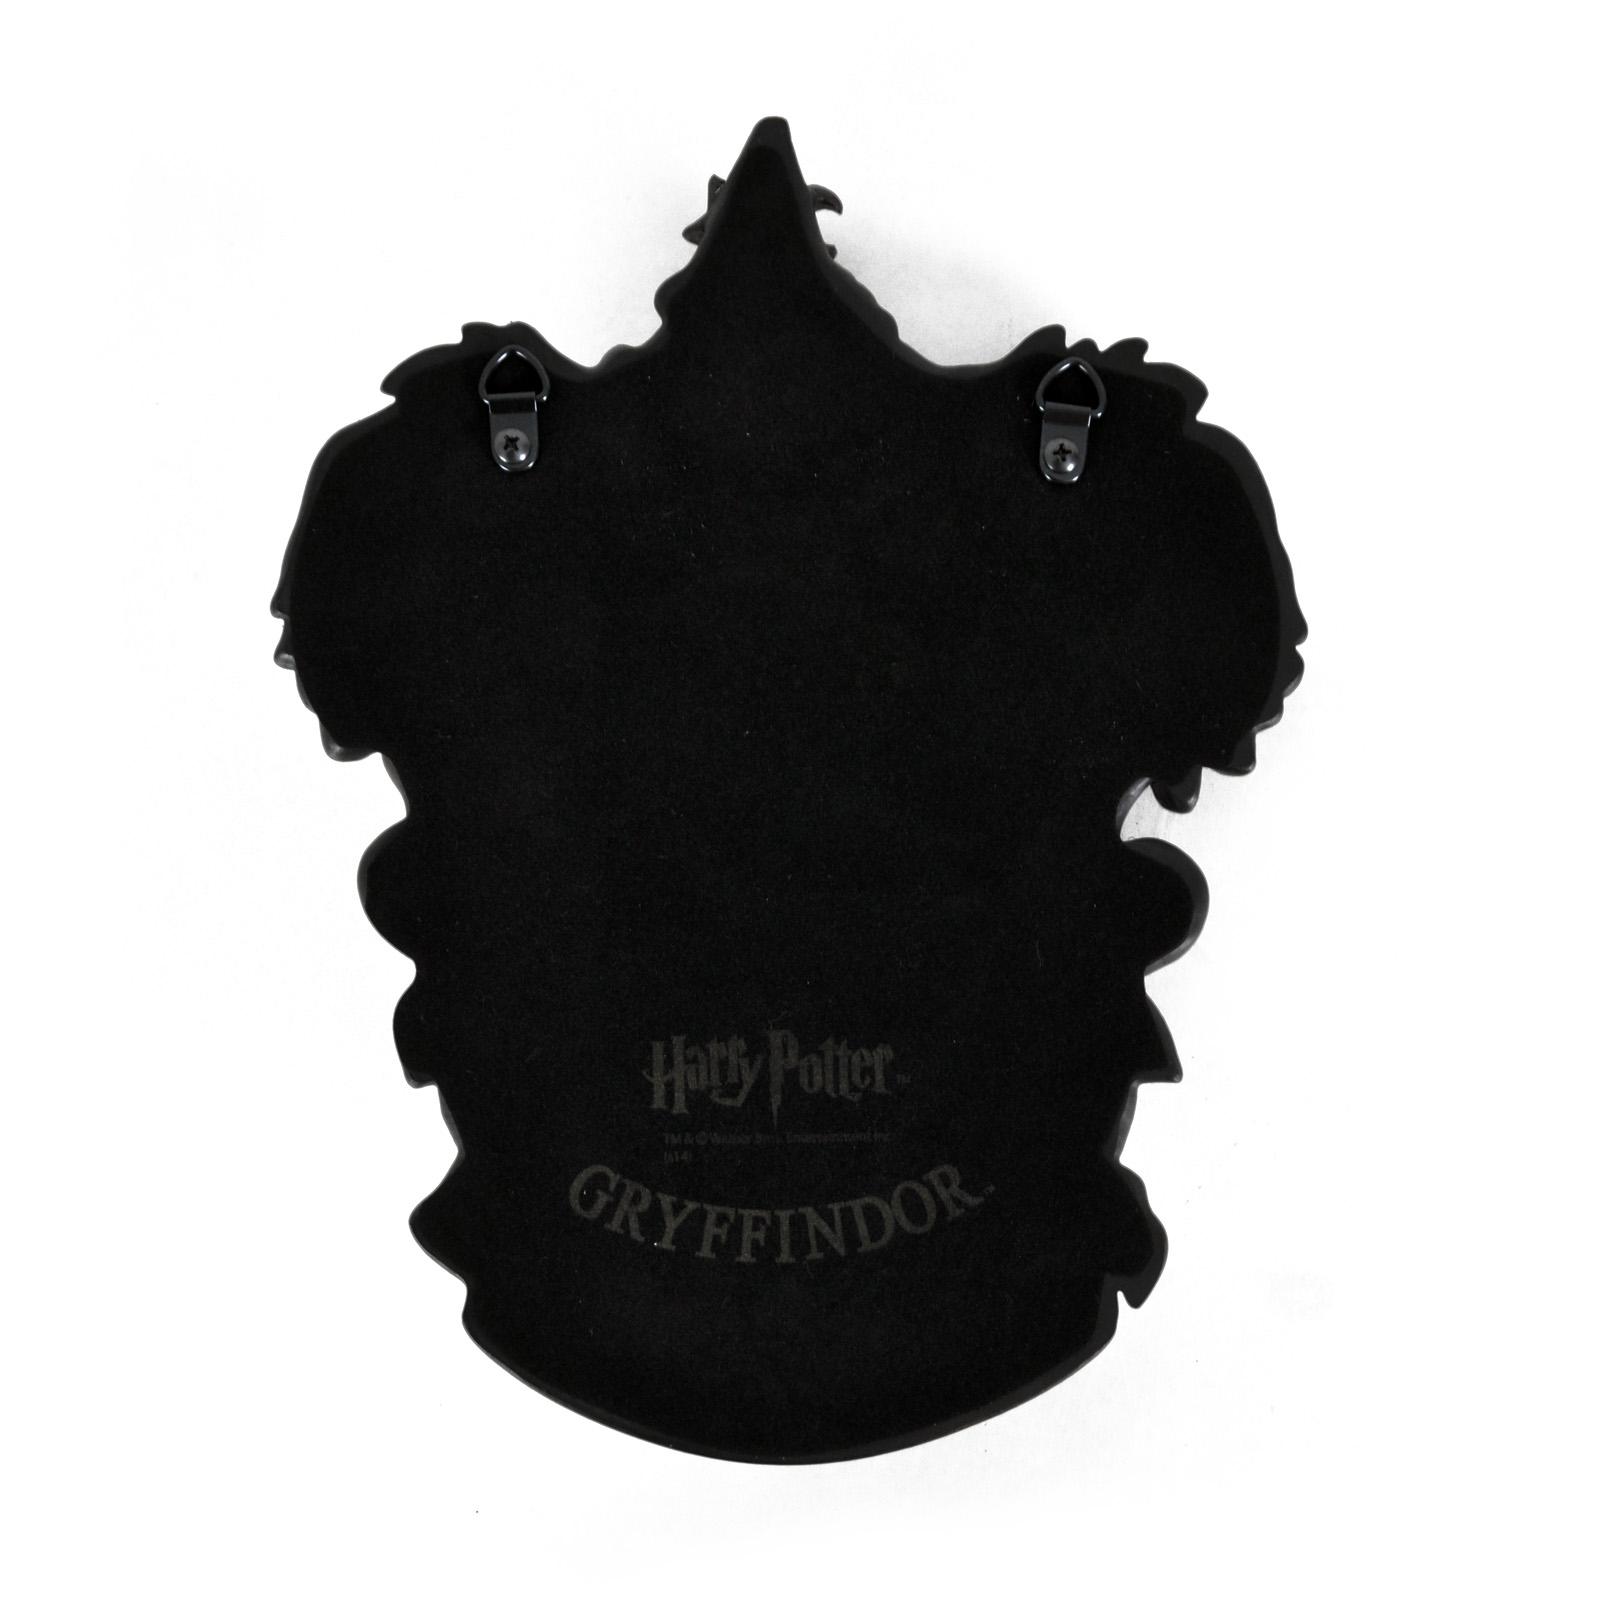 Harry Potter - Gryffindor Wappen